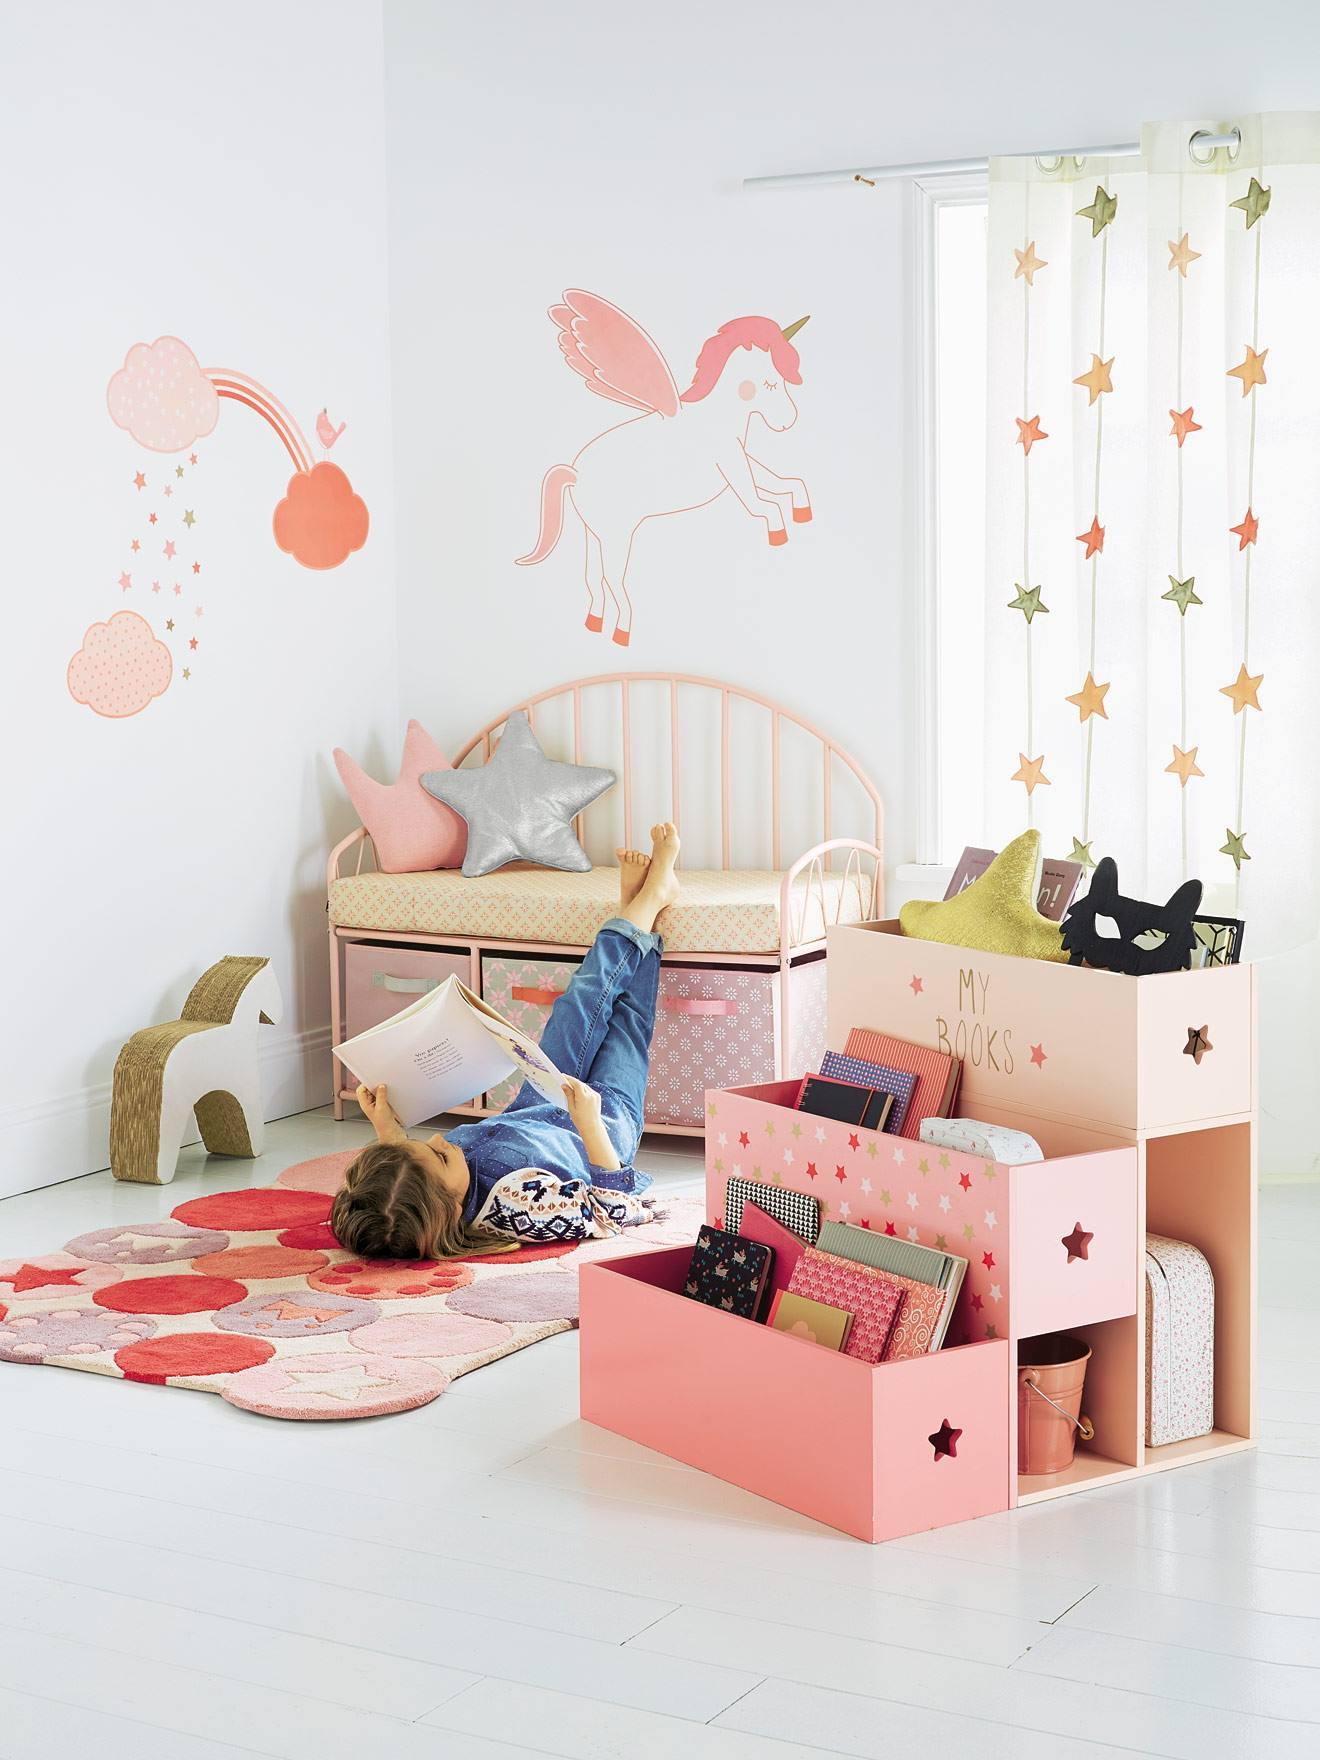 vertbaudet stickers vertbaudet stickers with vertbaudet stickers cool height gauge sticker. Black Bedroom Furniture Sets. Home Design Ideas